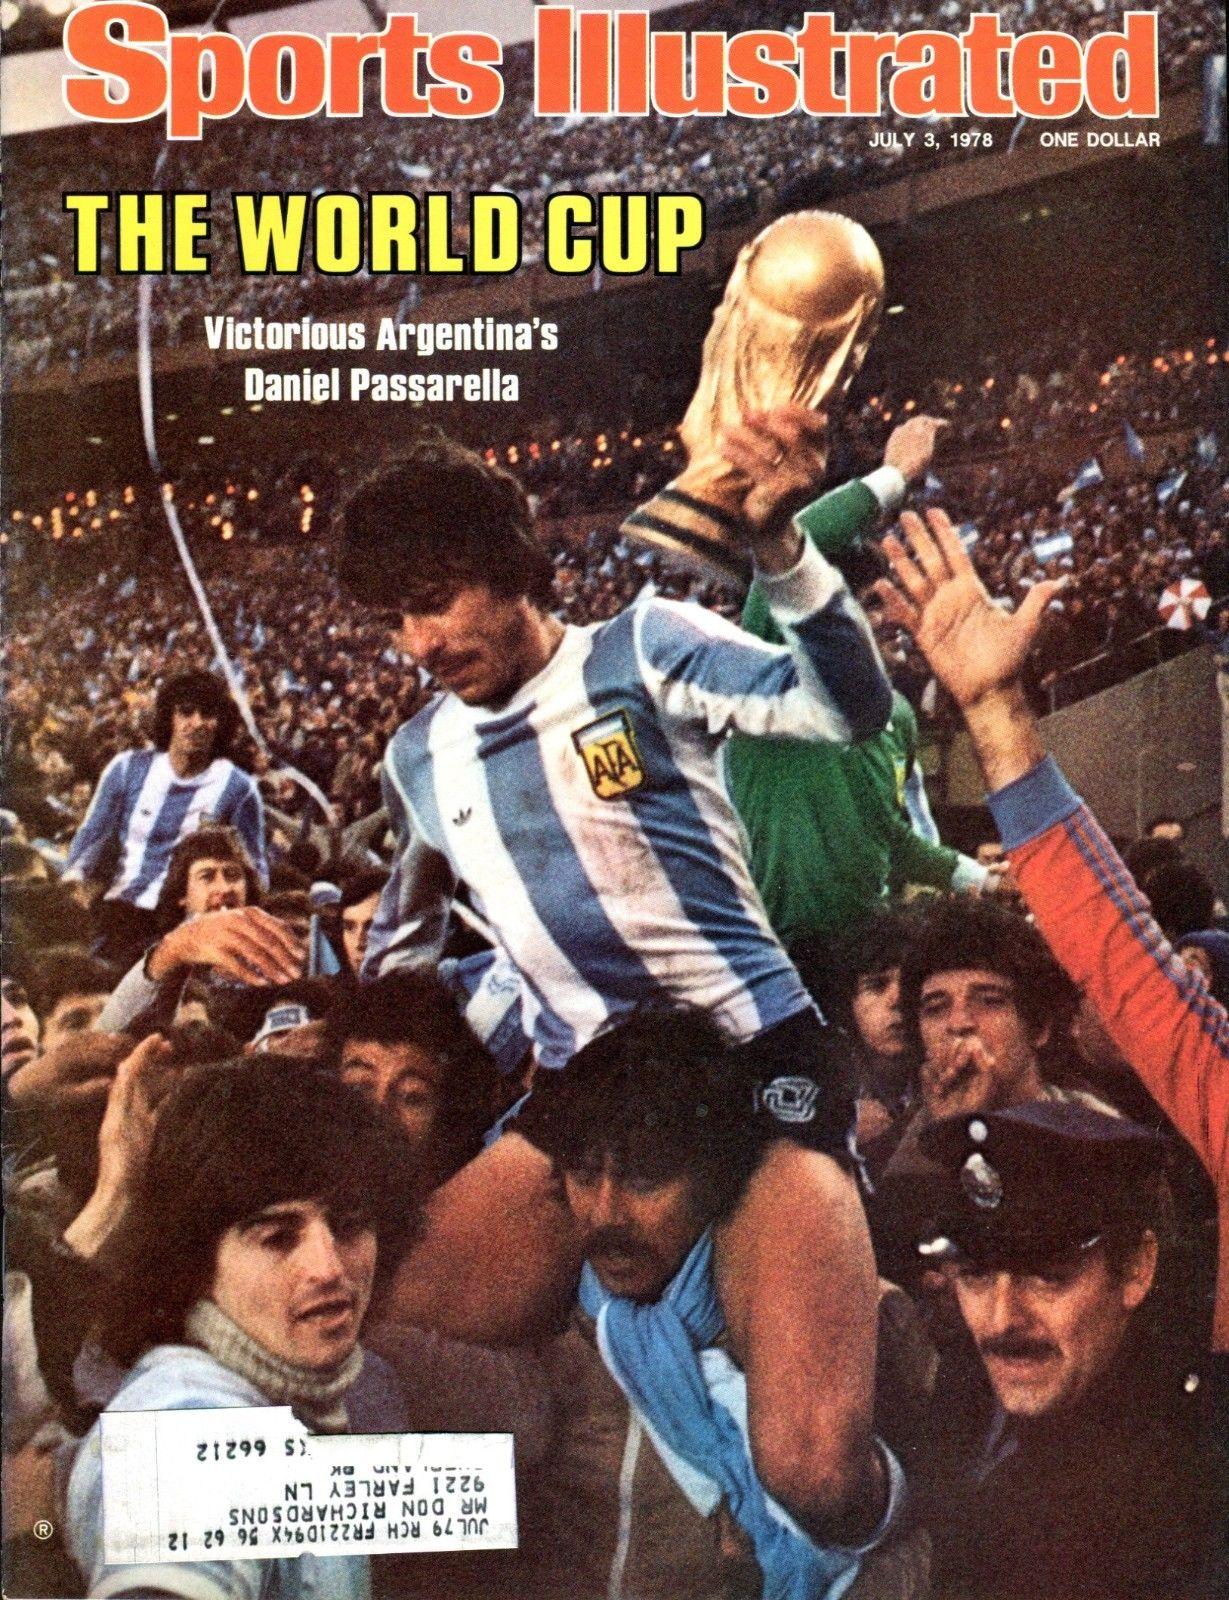 SI Sports Illustrated July 3 1978 Daniel Passarella Soccer